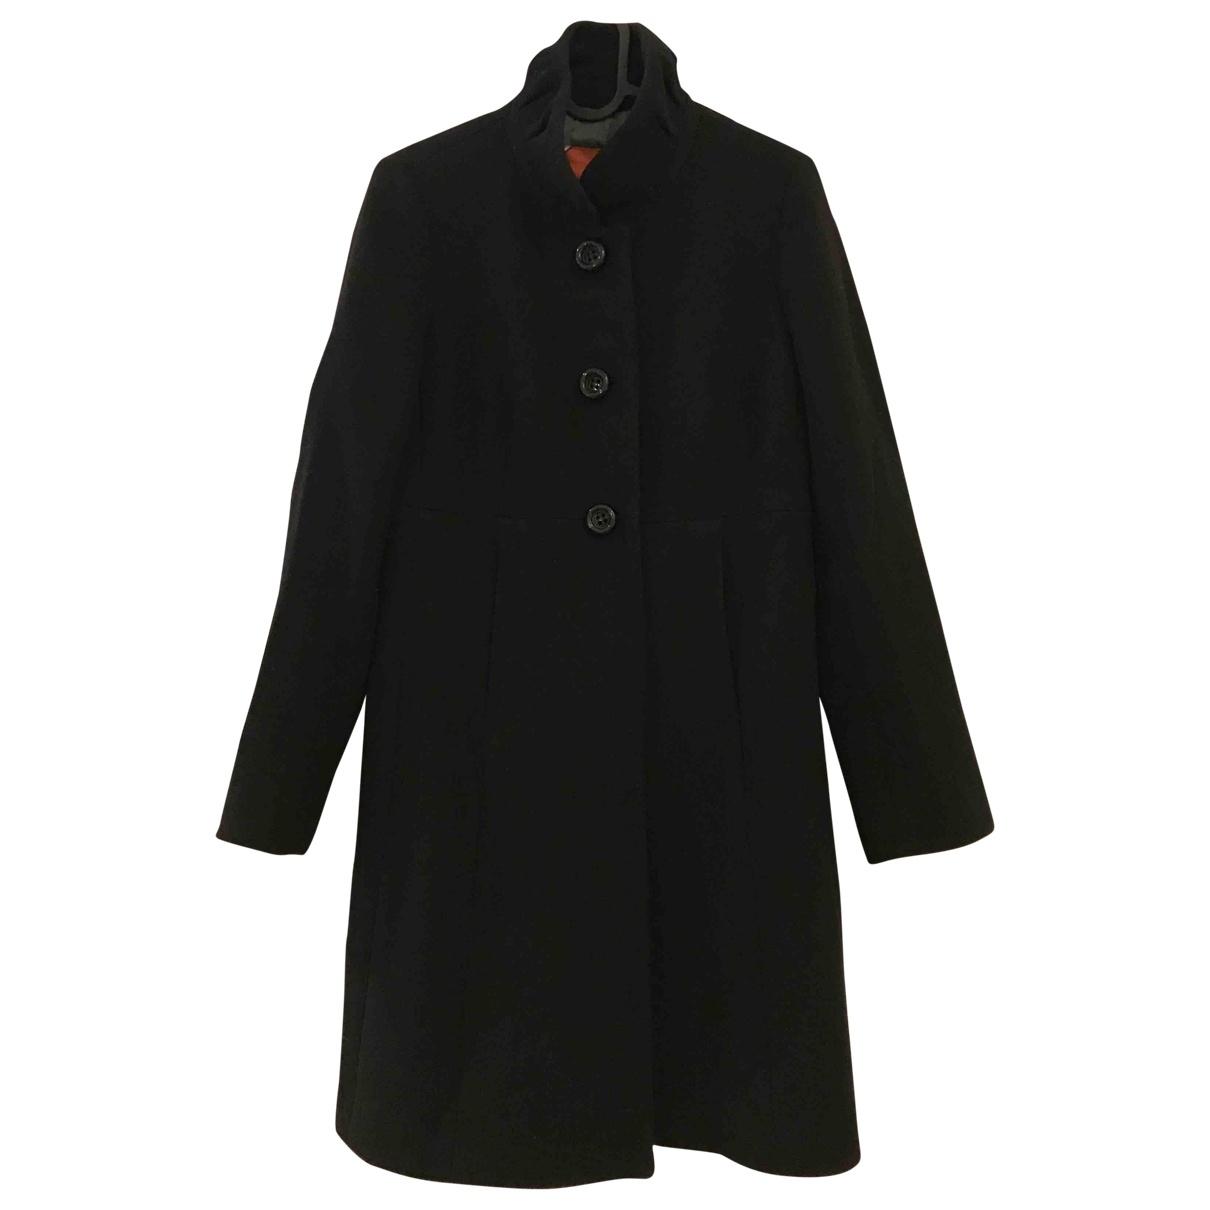 J.crew \N Black Wool coat for Women 8 US